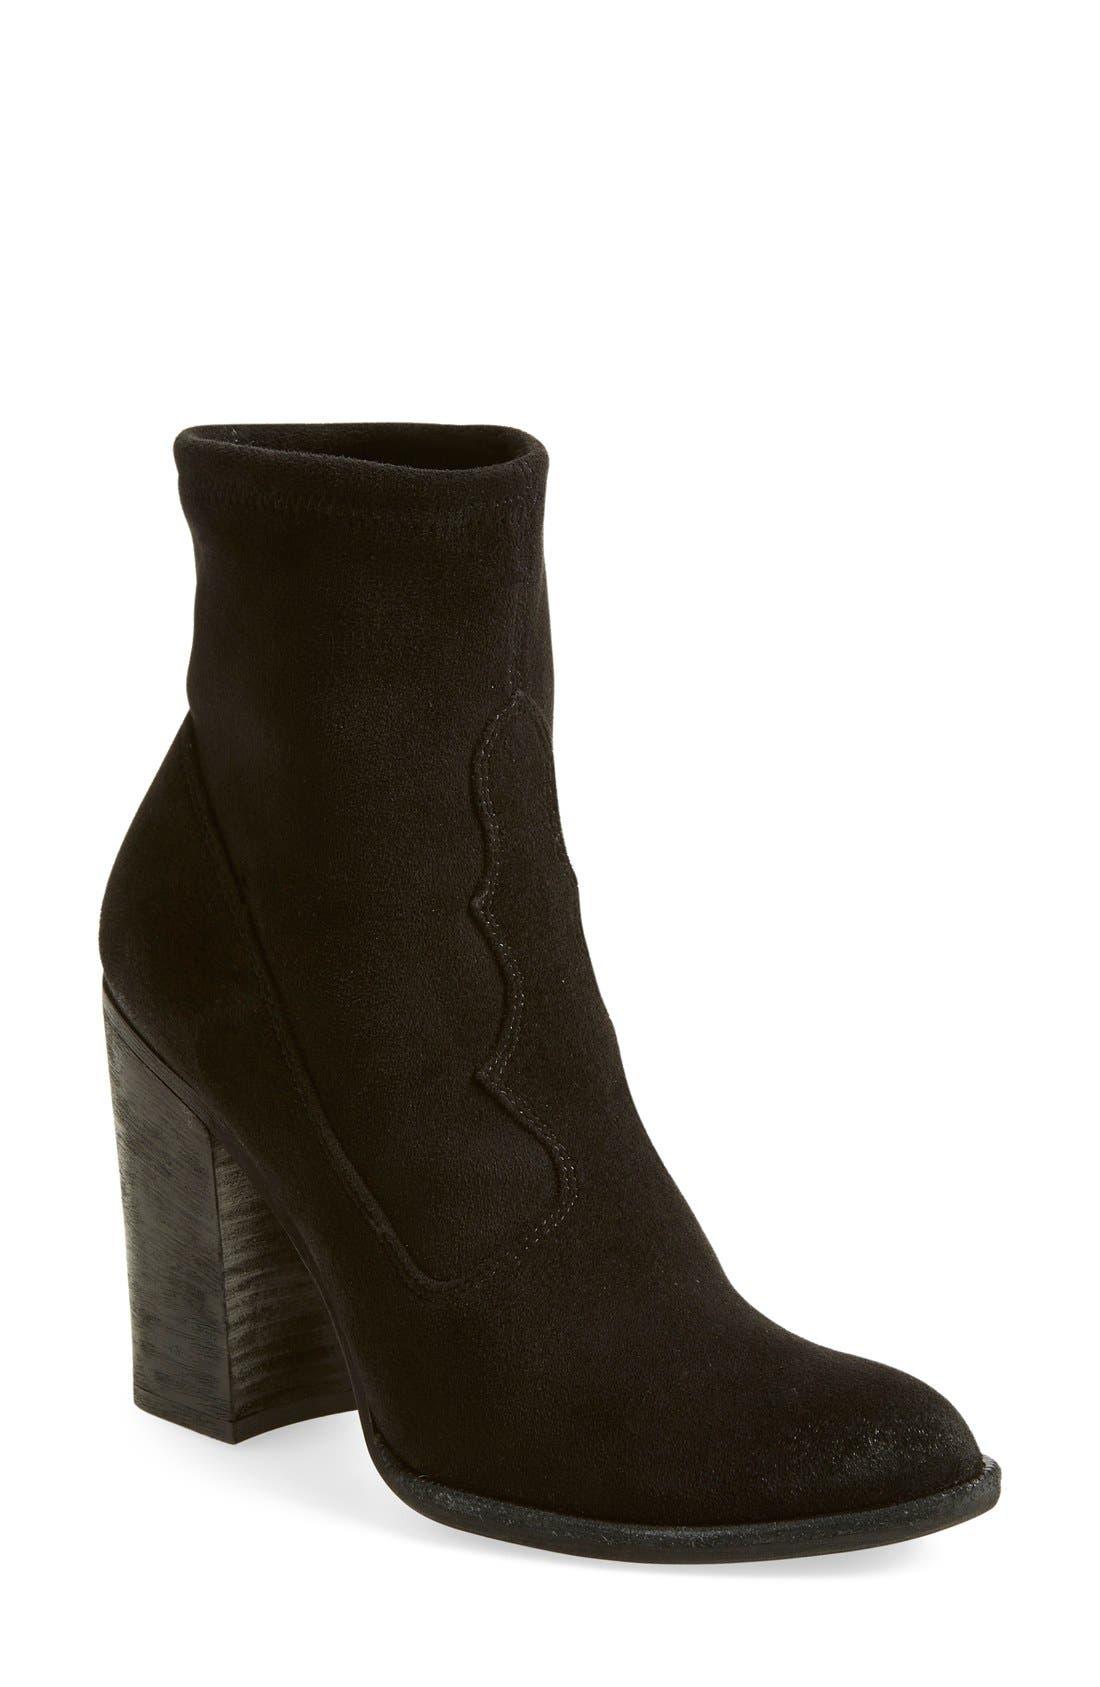 Main Image - Dolce Vita 'Cammi' Boot (Women)